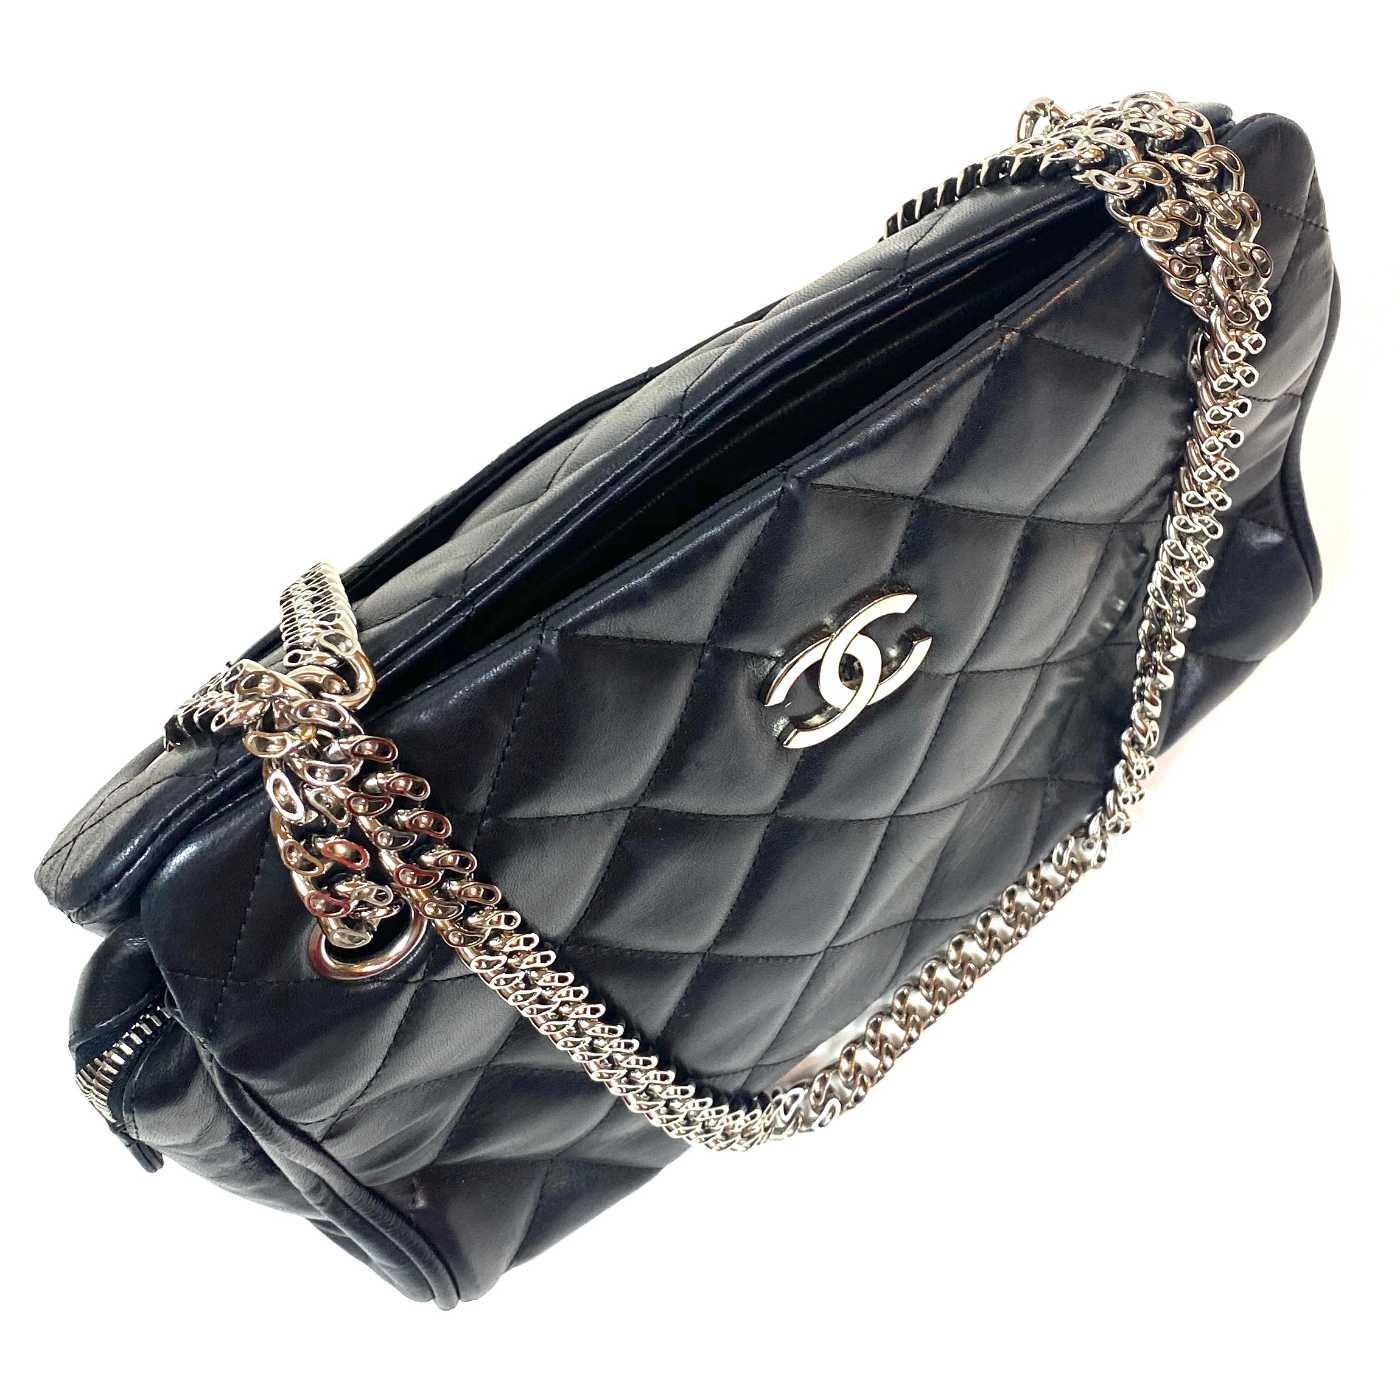 Bolsa Chanel Matelassê Preta